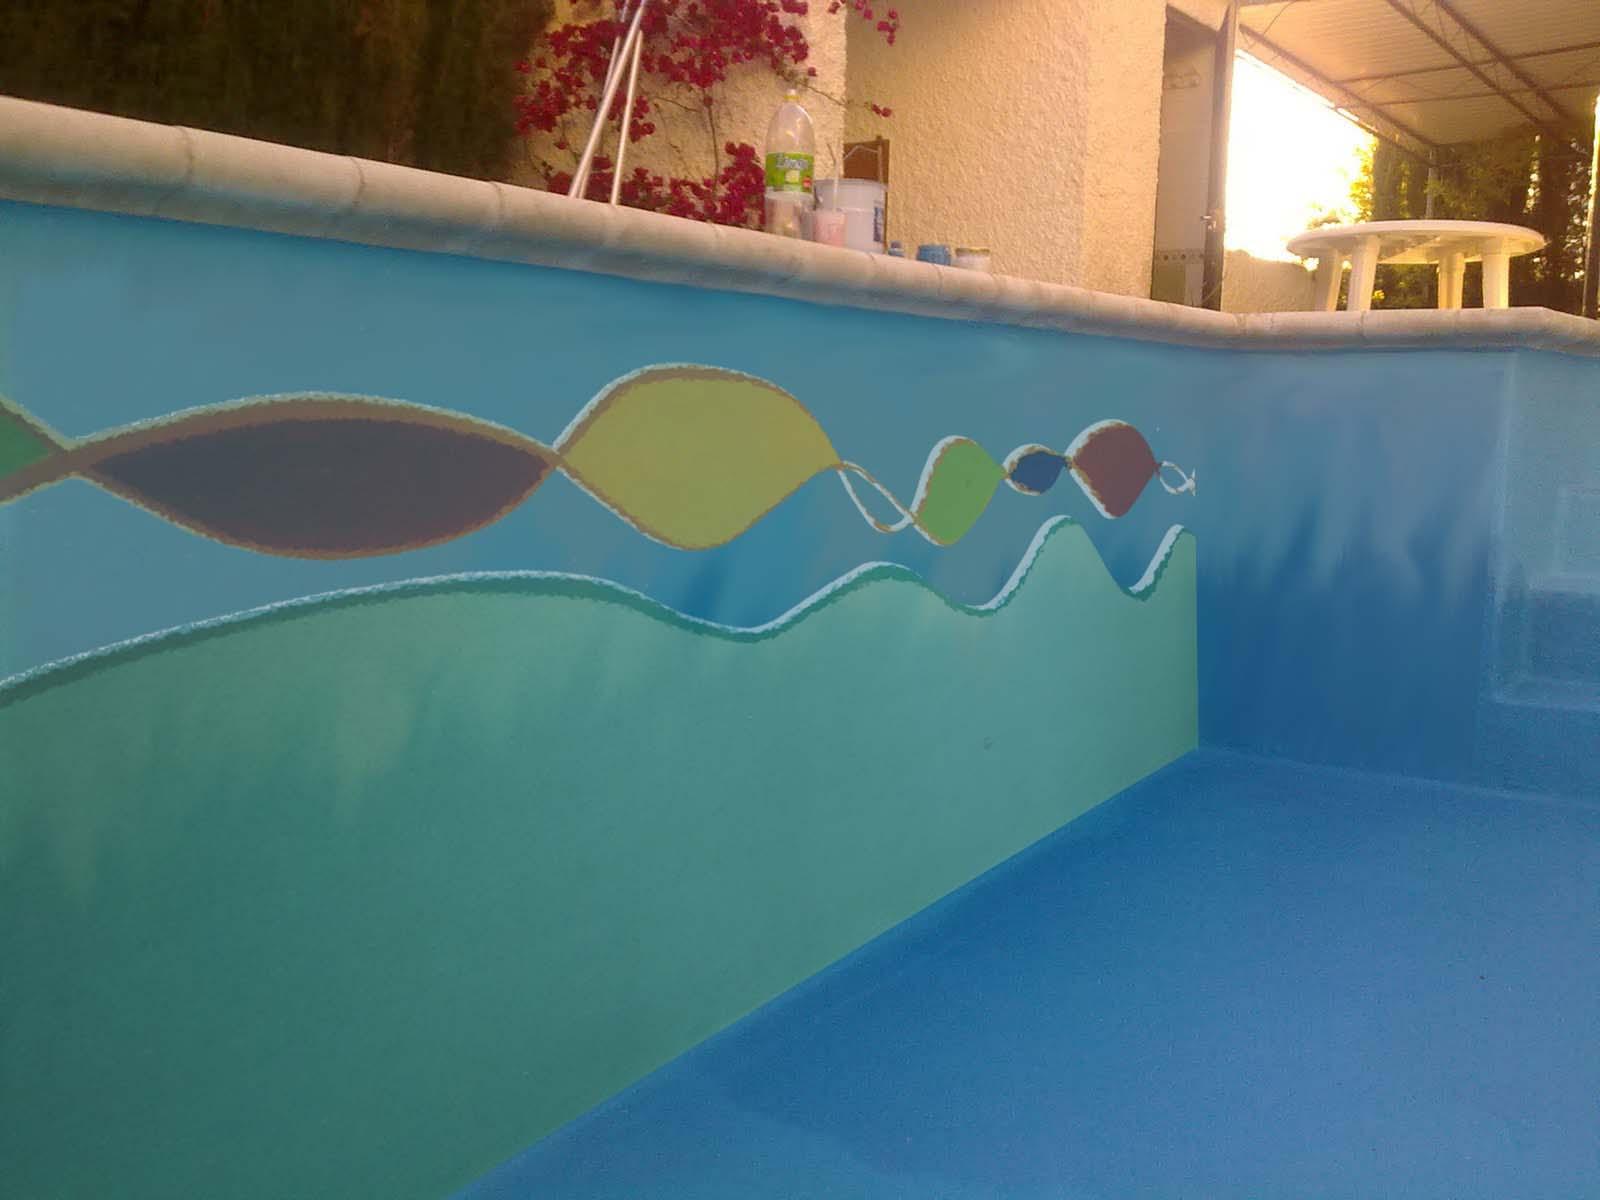 Deco project murales en piletas for Piletas de concreto